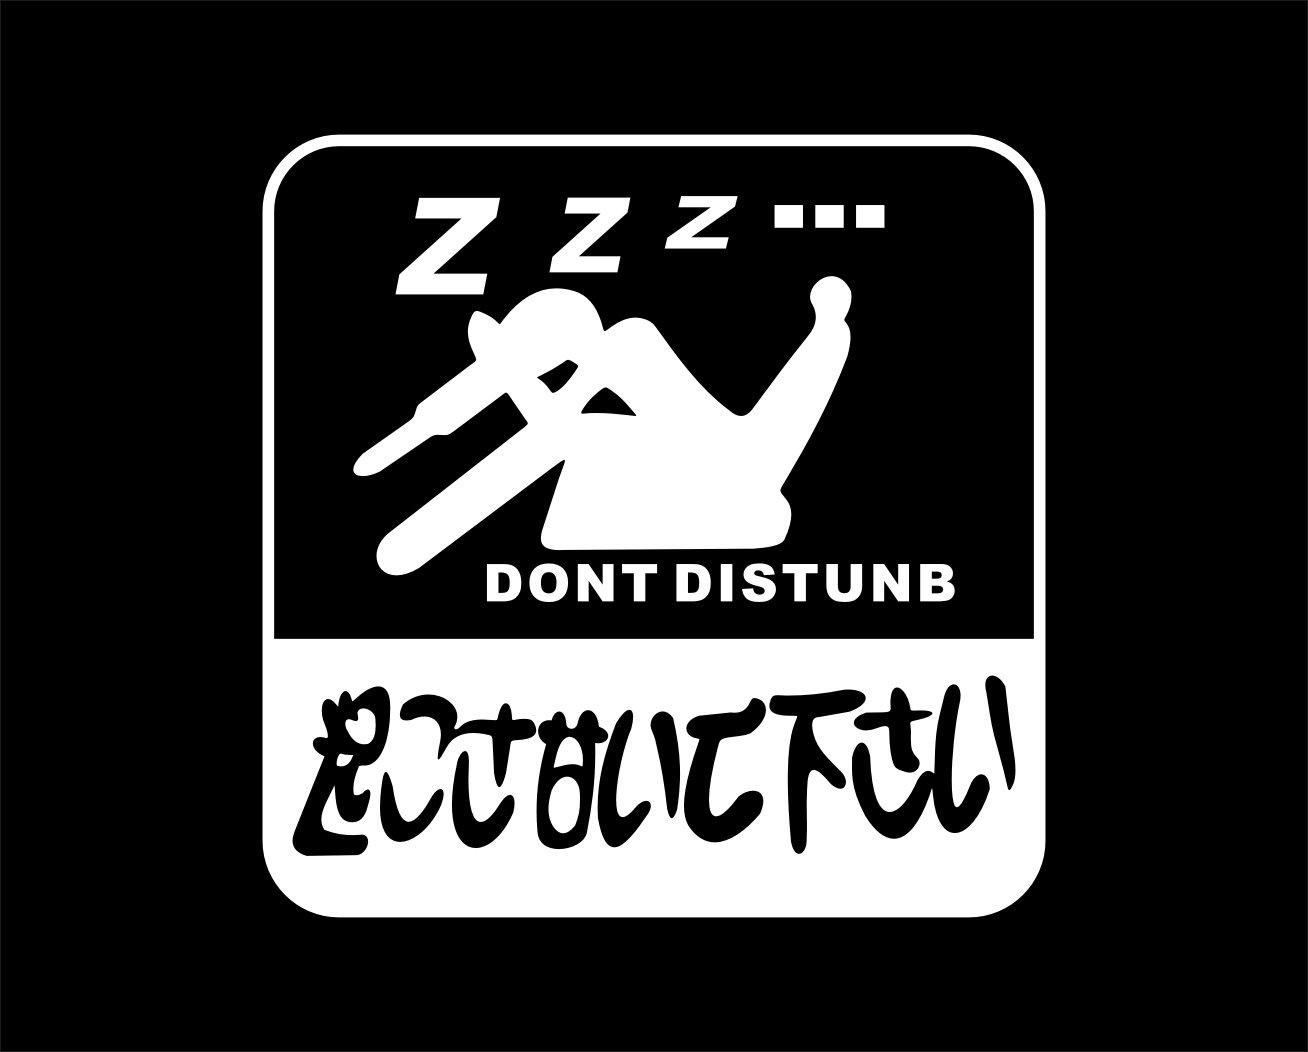 Please Do Not disturb|sticker|bike|cool|funny|car sticker|cuttingステッカー   B074NNP964